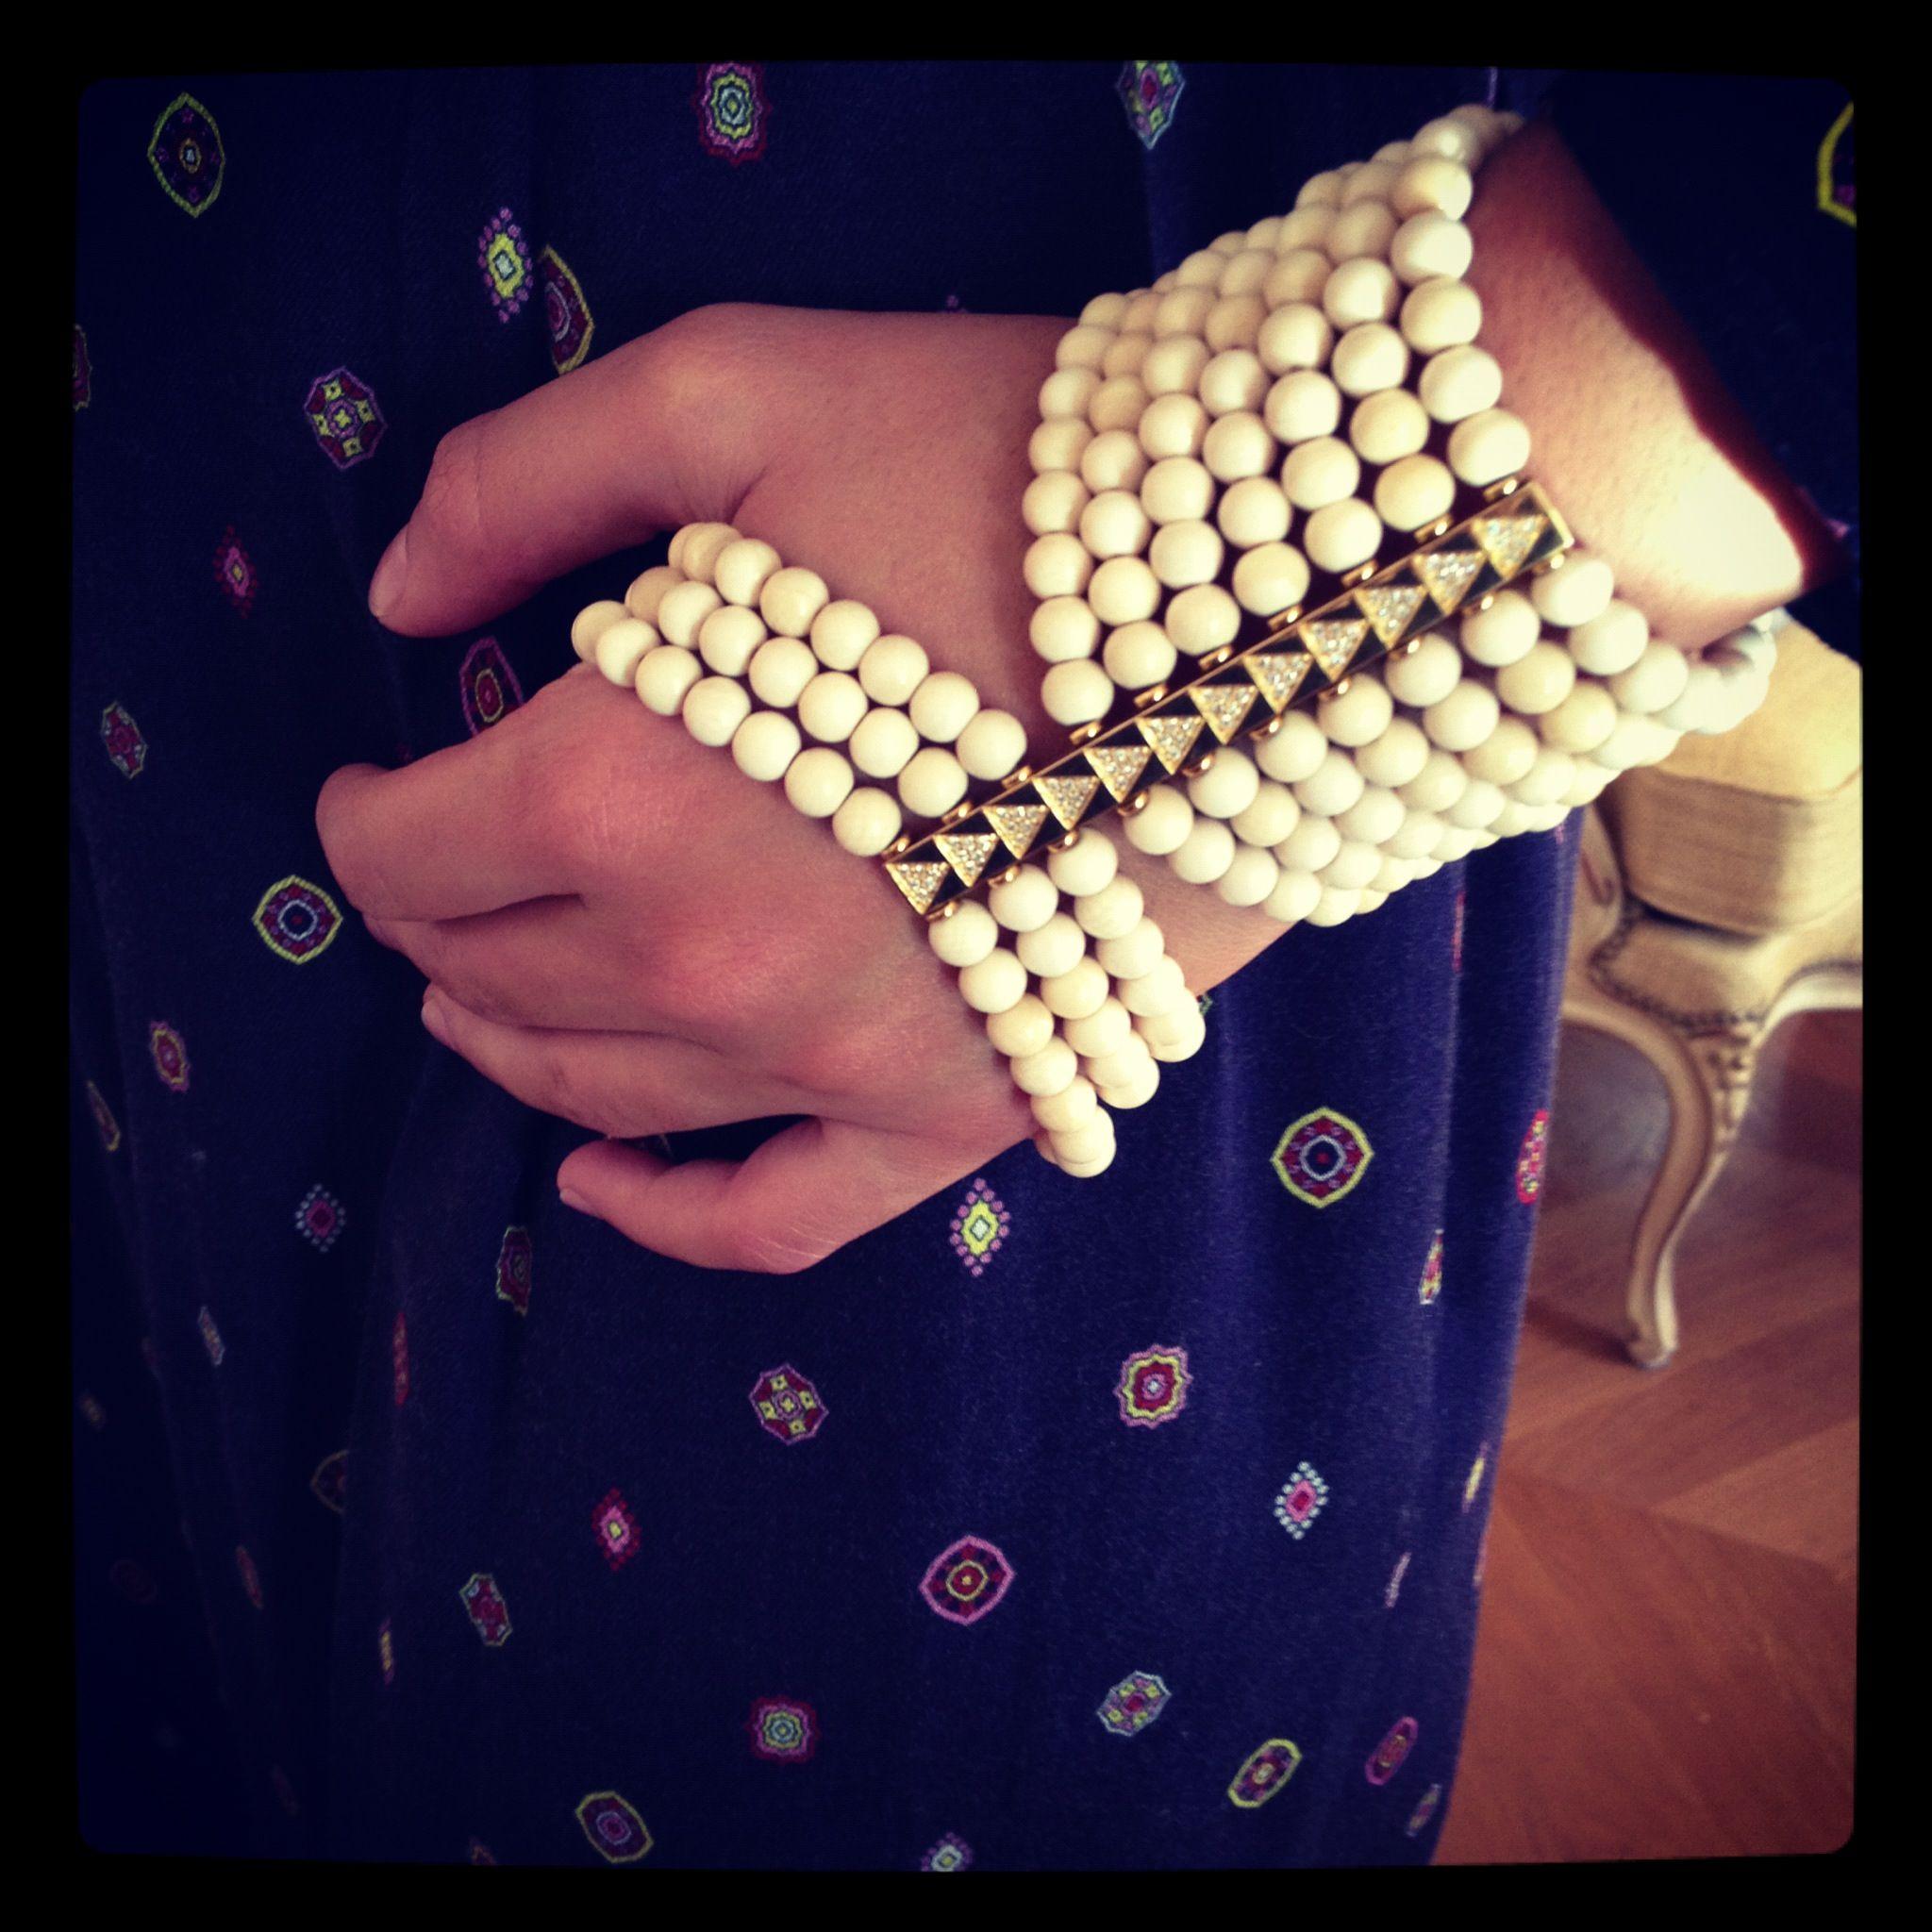 Lebanese jewelry designer Noor Fares Colette Le Mason